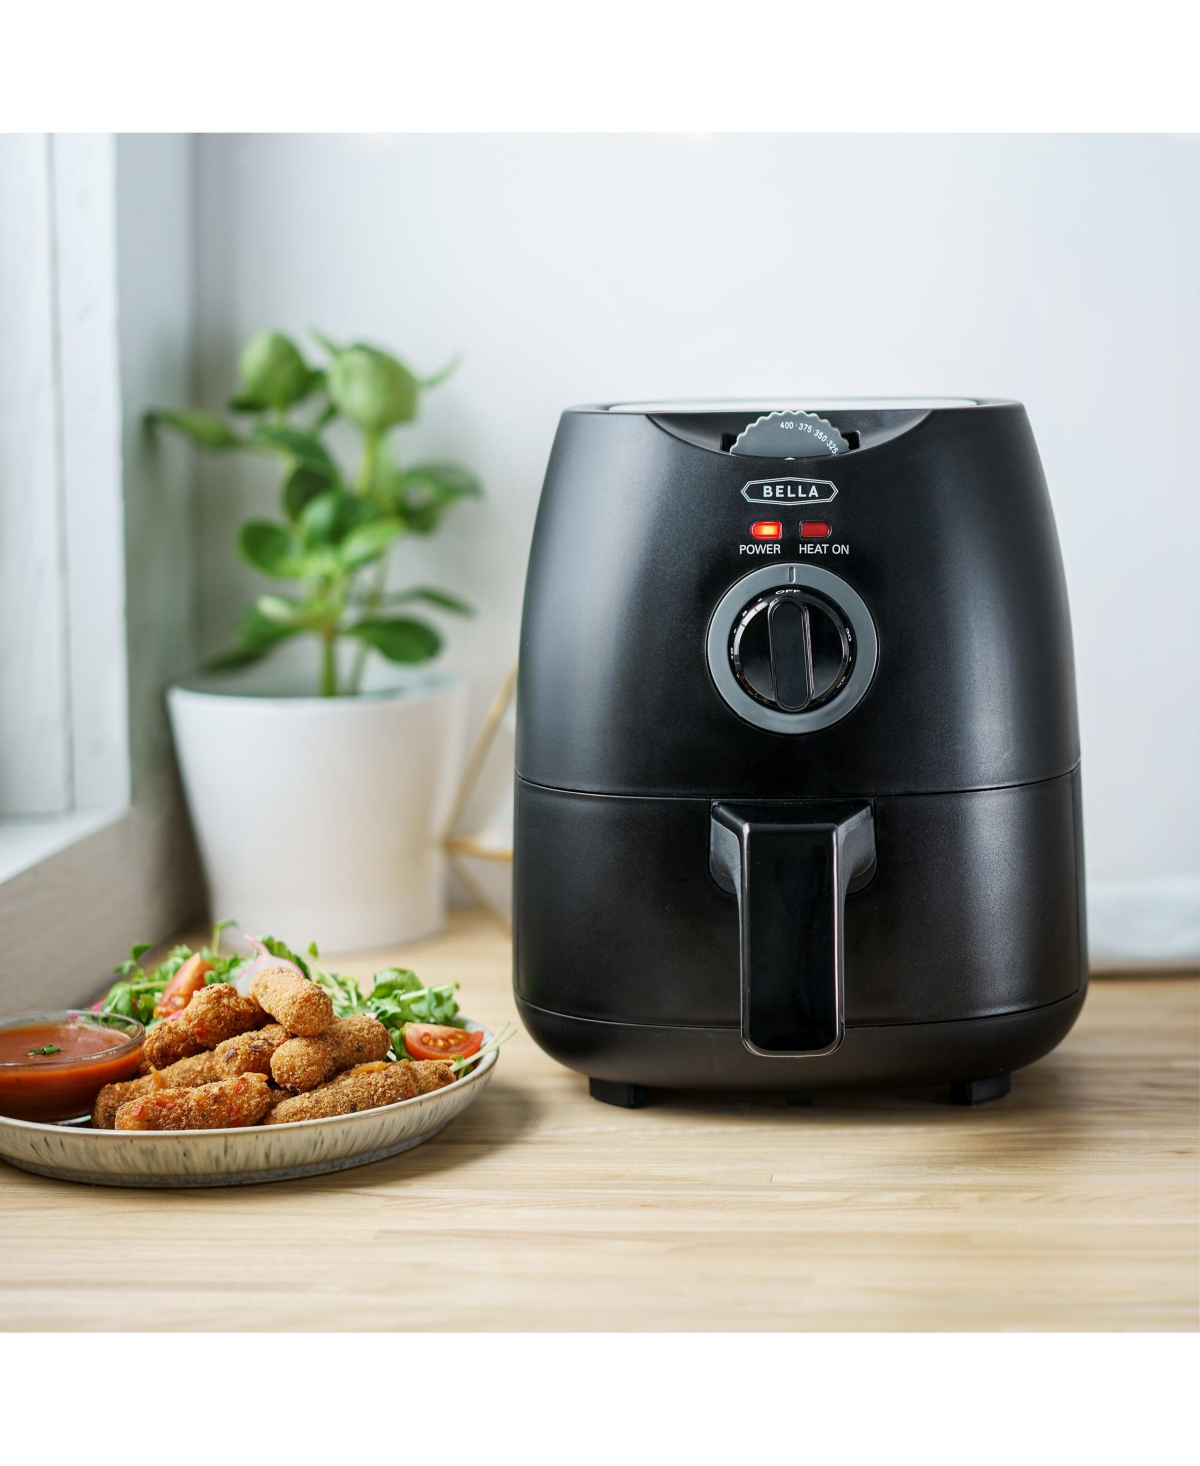 Bella 2-Quart Electric Air Fryer